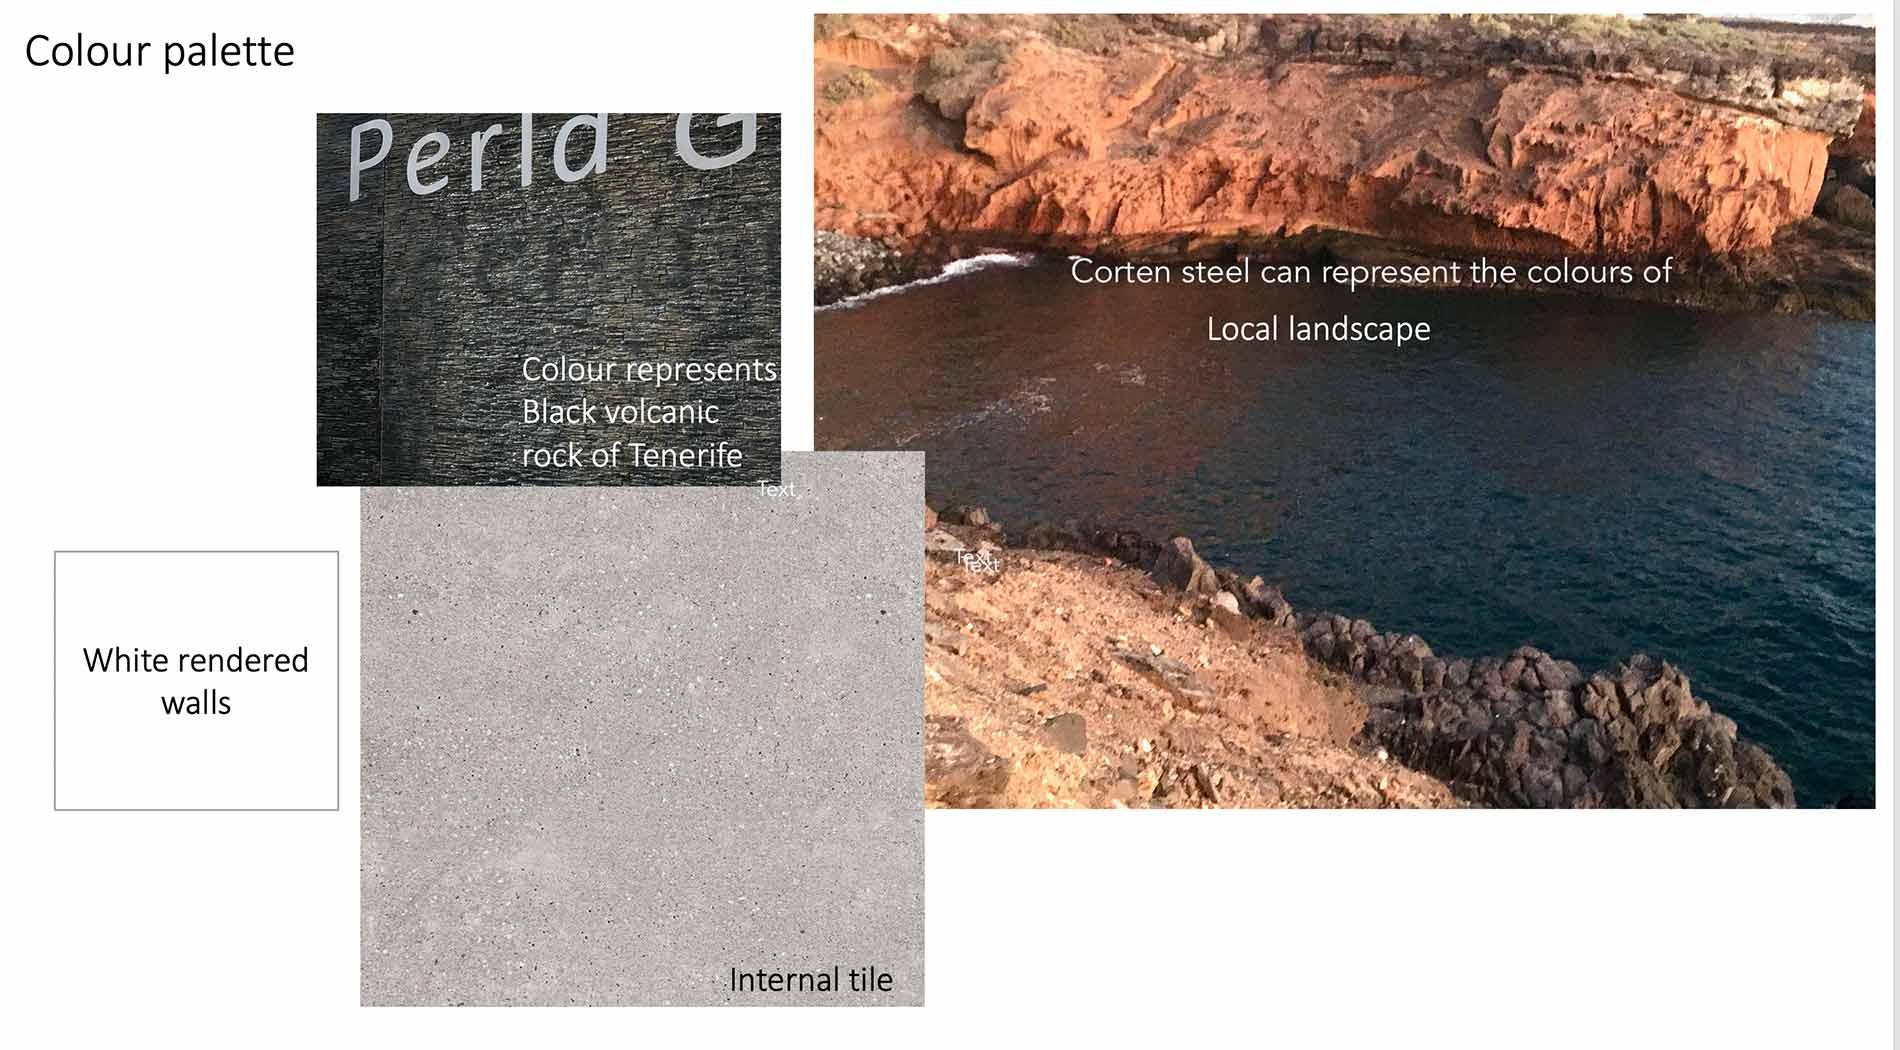 Tenerife design colour palette